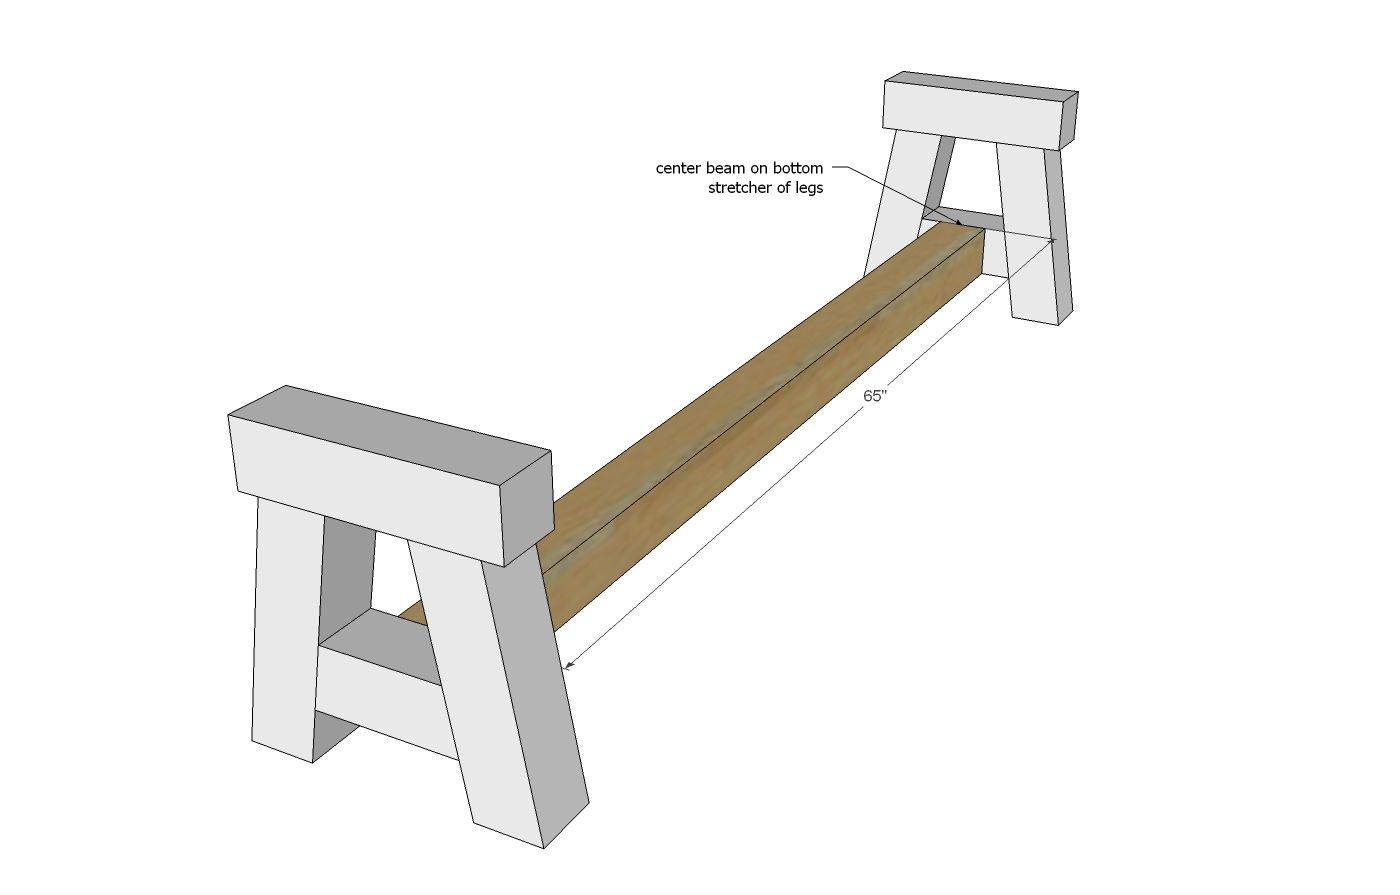 Tremendous 4X4 Truss Benches Home Decor Diy Furniture Chair Machost Co Dining Chair Design Ideas Machostcouk